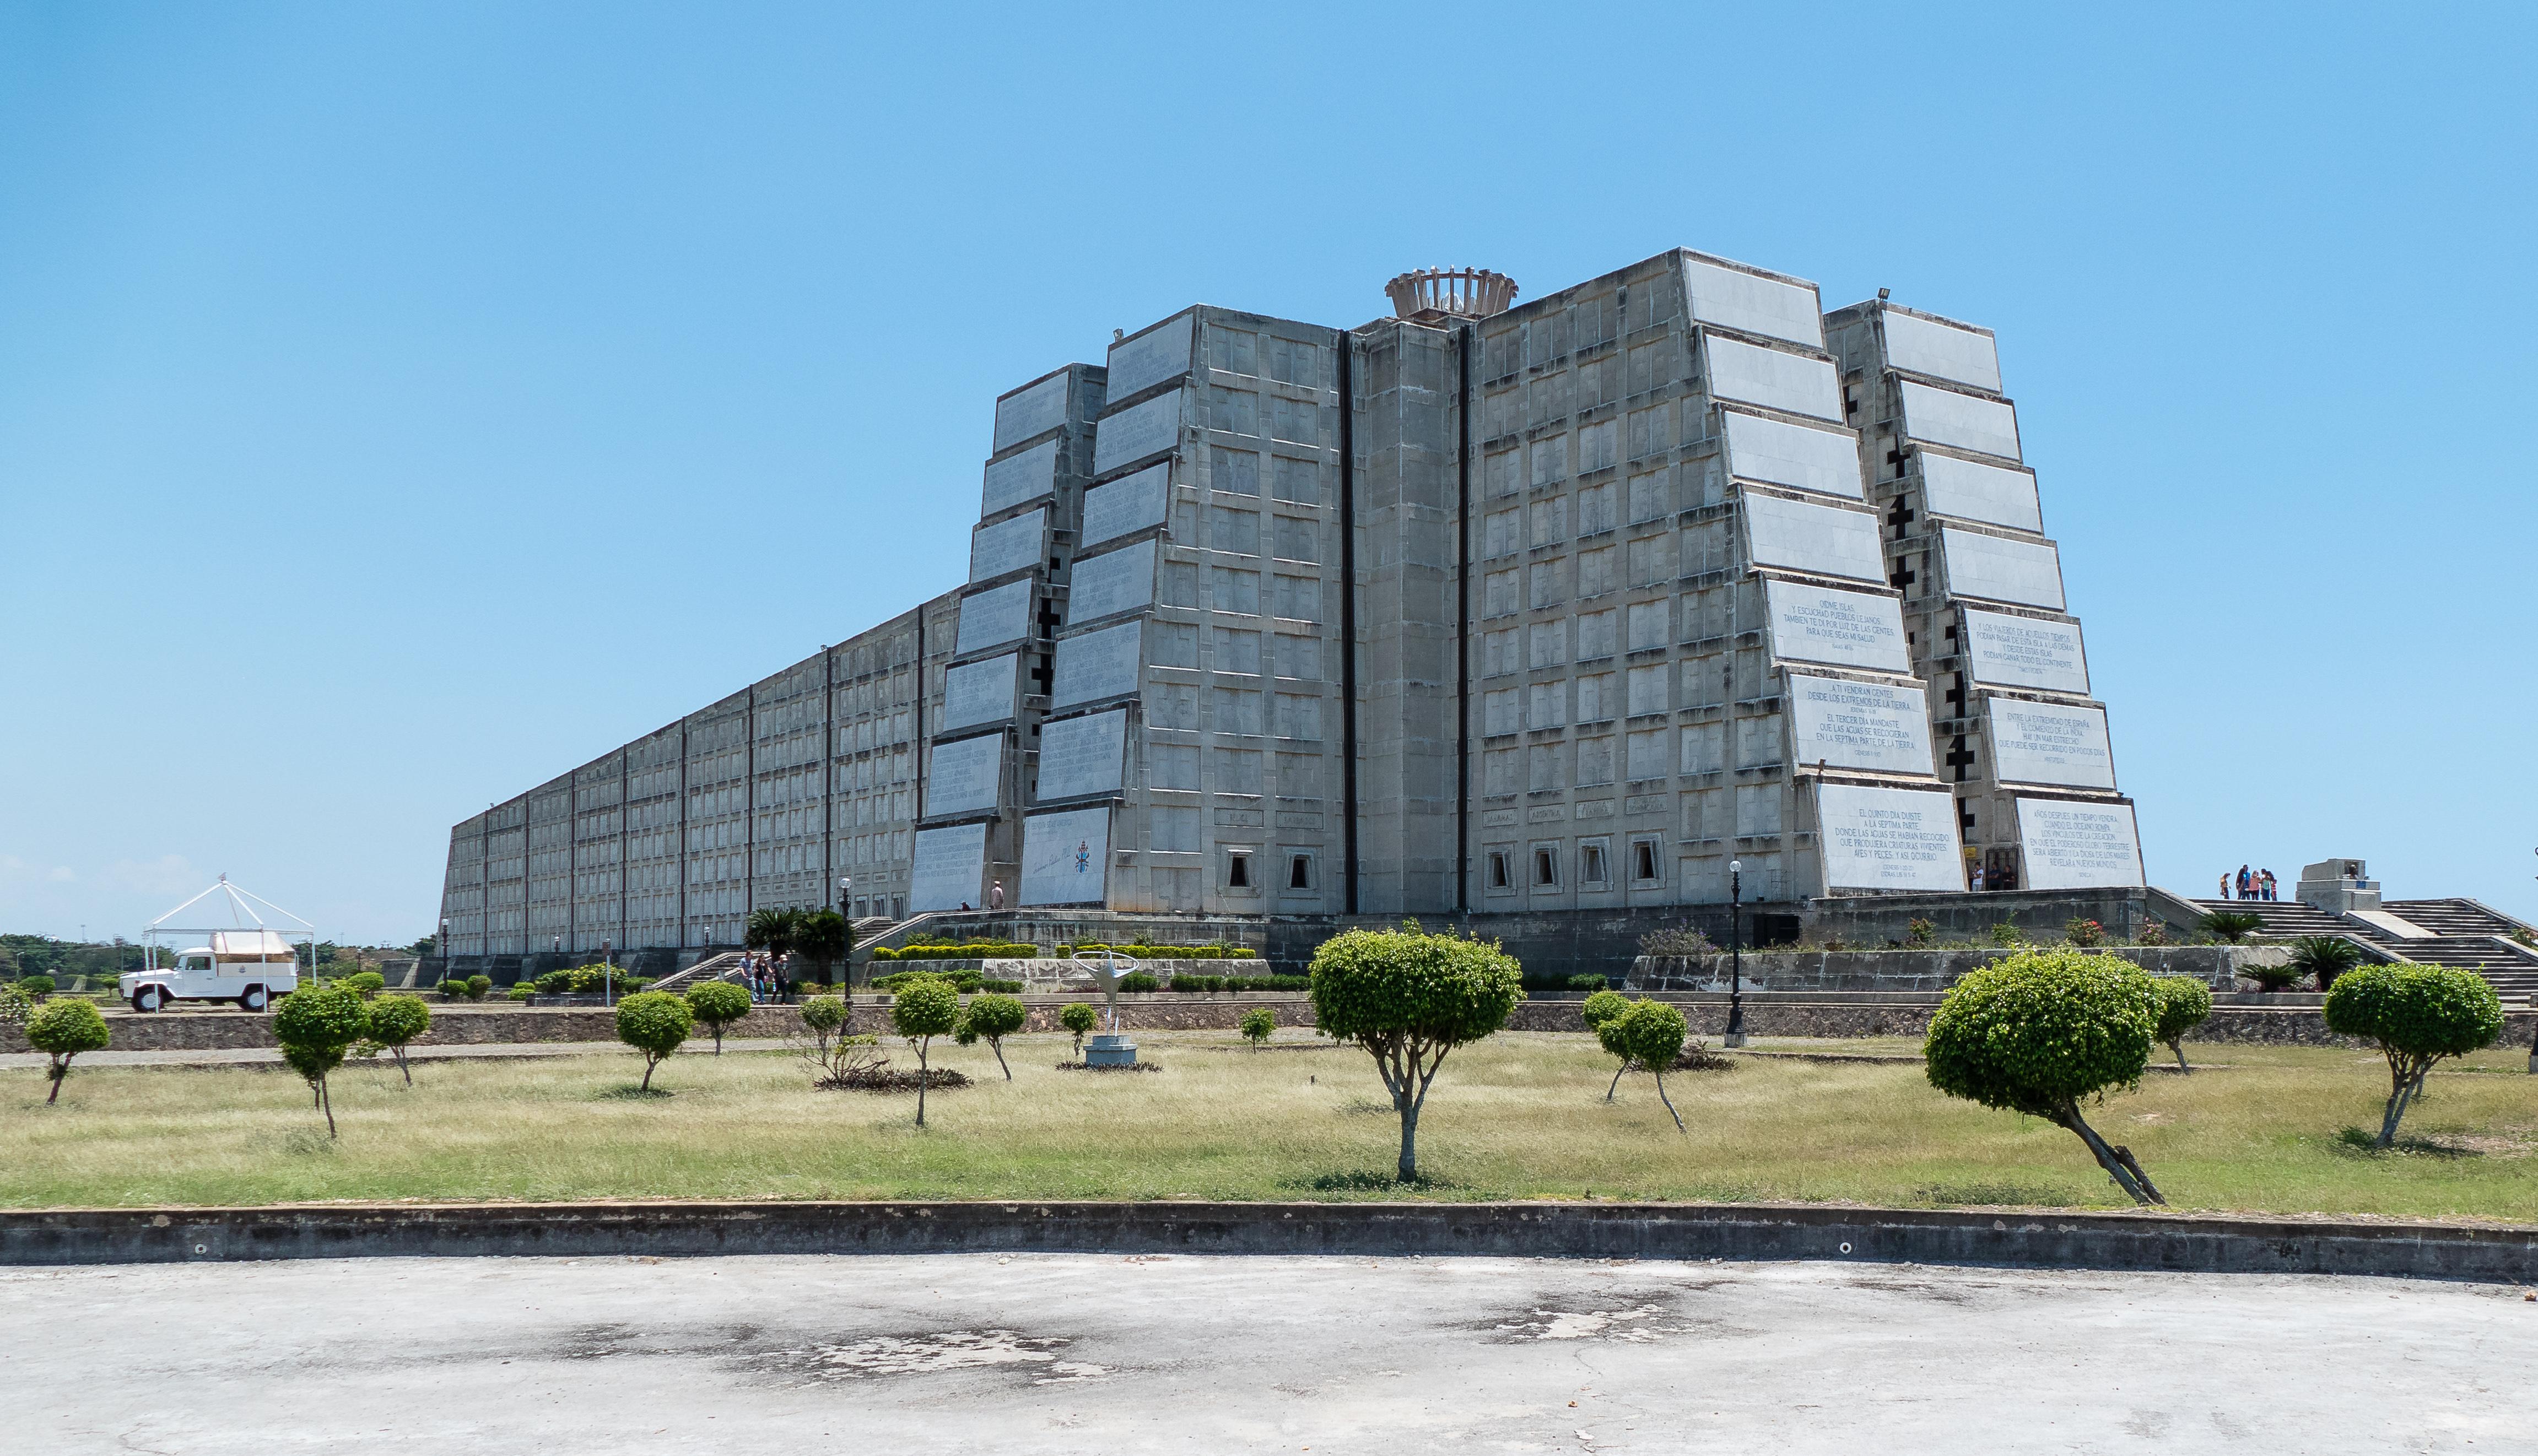 File:Santo Domingo.El Faro a Colón.20170402.jpg - Wikimedia Commons